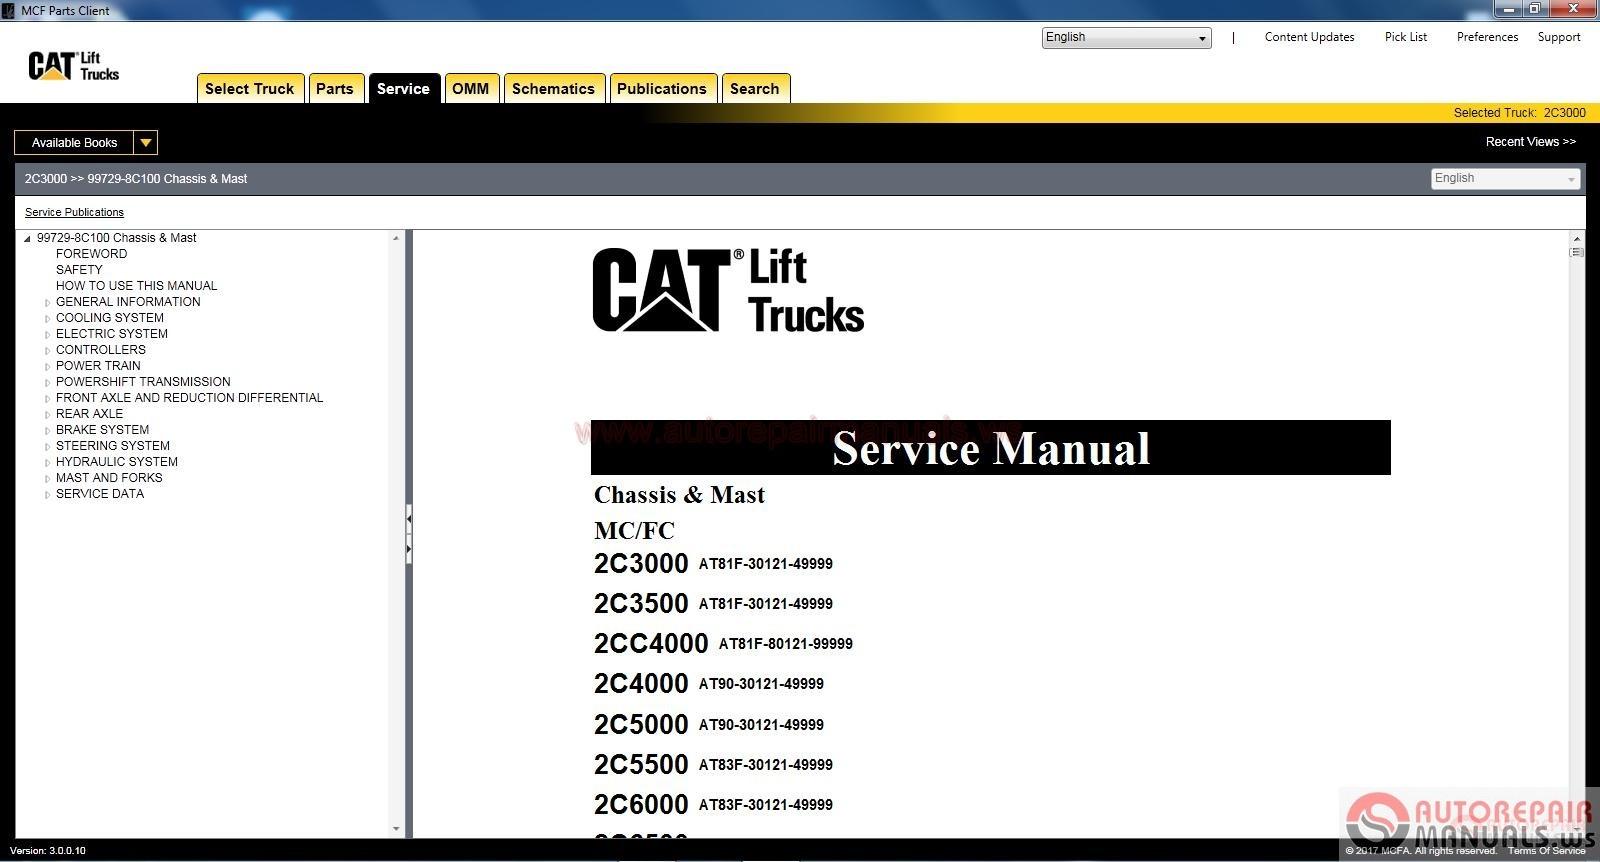 caterpillar fork lift trucks mcfa  03 2017  full activated